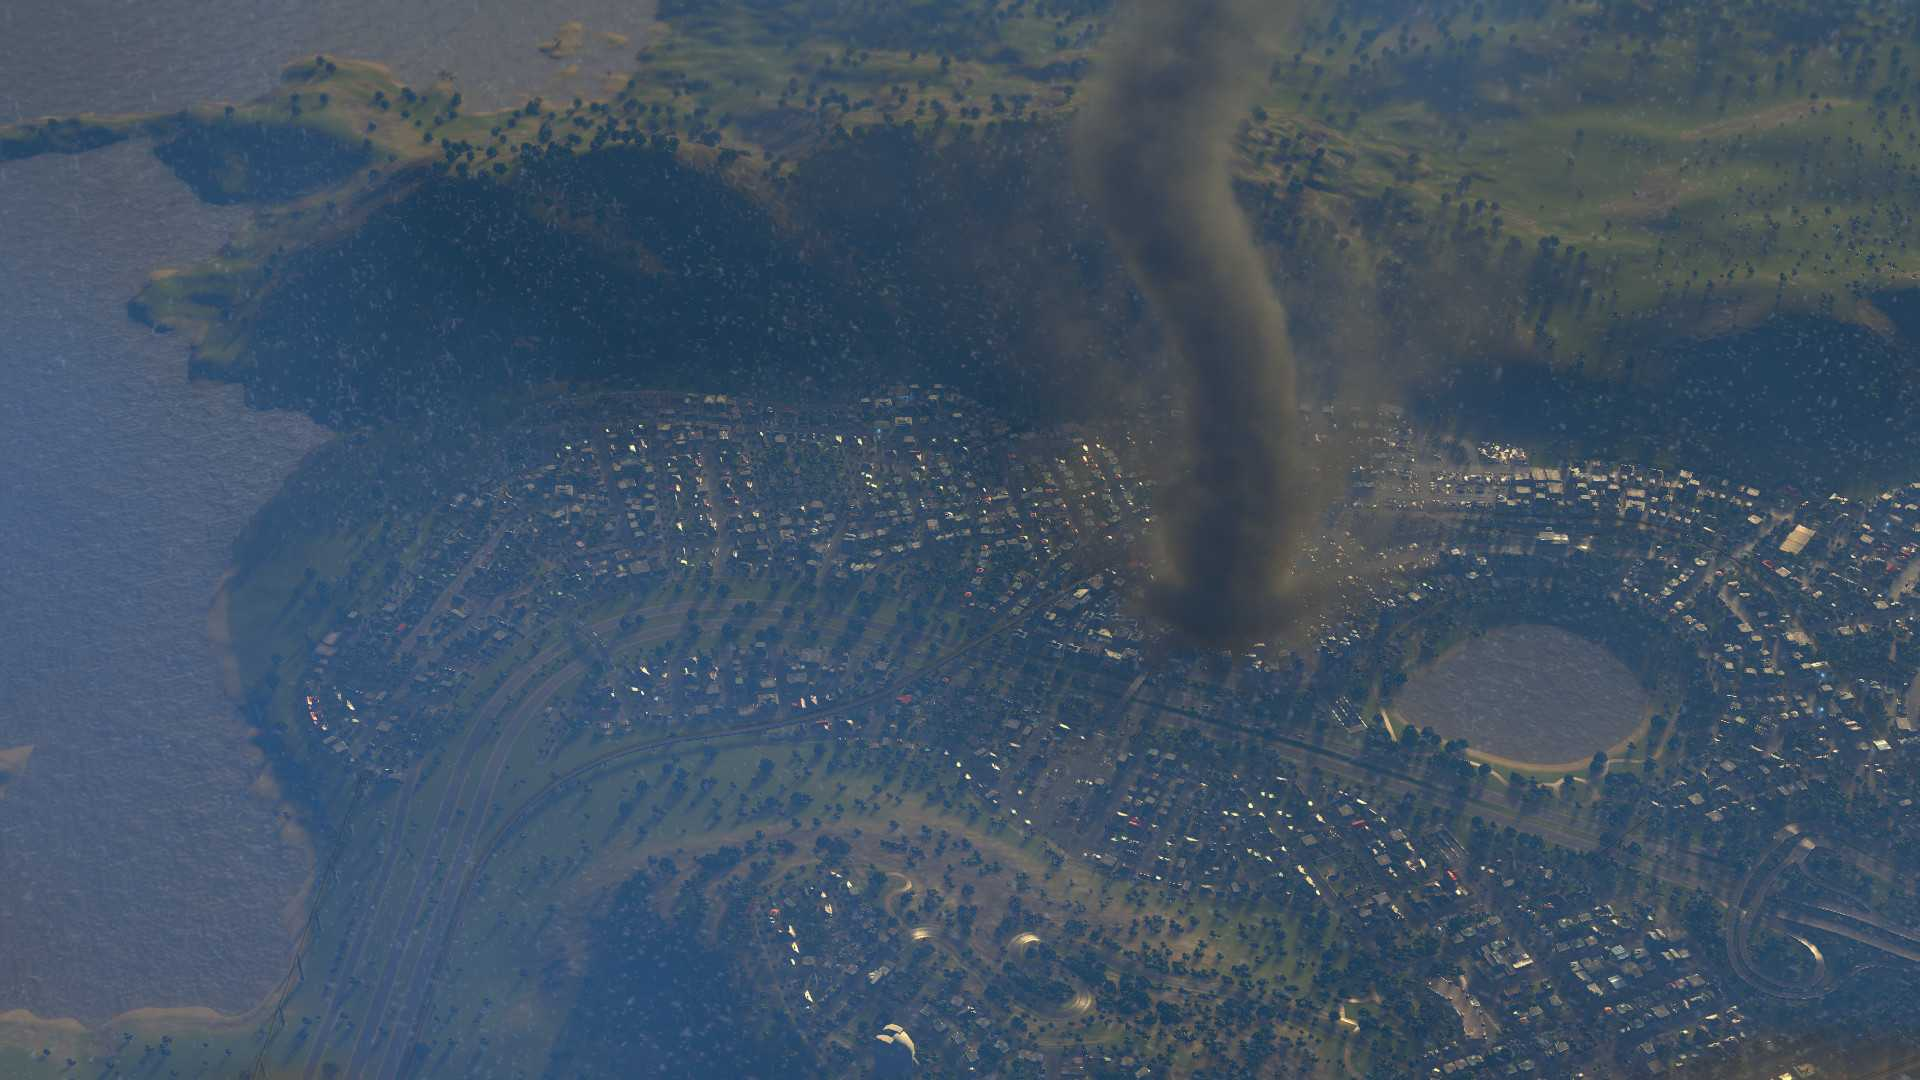 Cities. Skylines. Natural Disasters дешевая покупка со скидкой